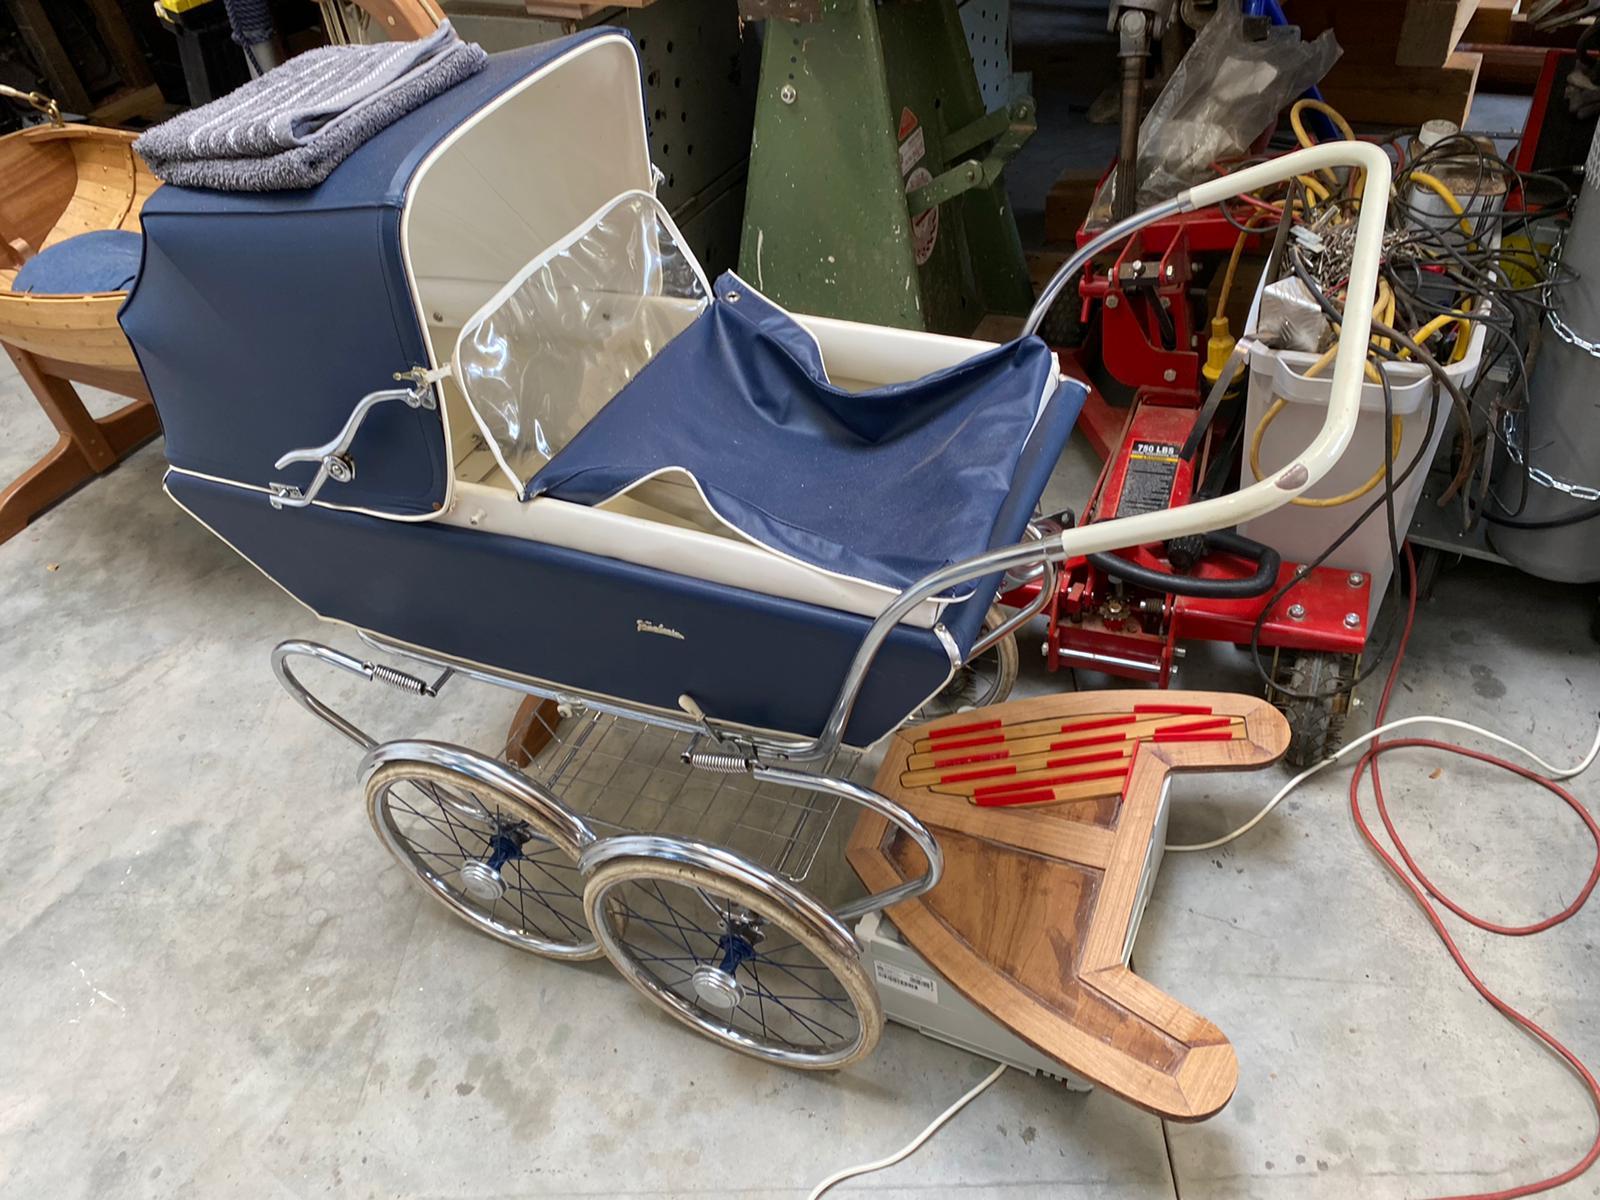 Teak-Trittbrett-Kinderwagen-Norman-Bootsbau